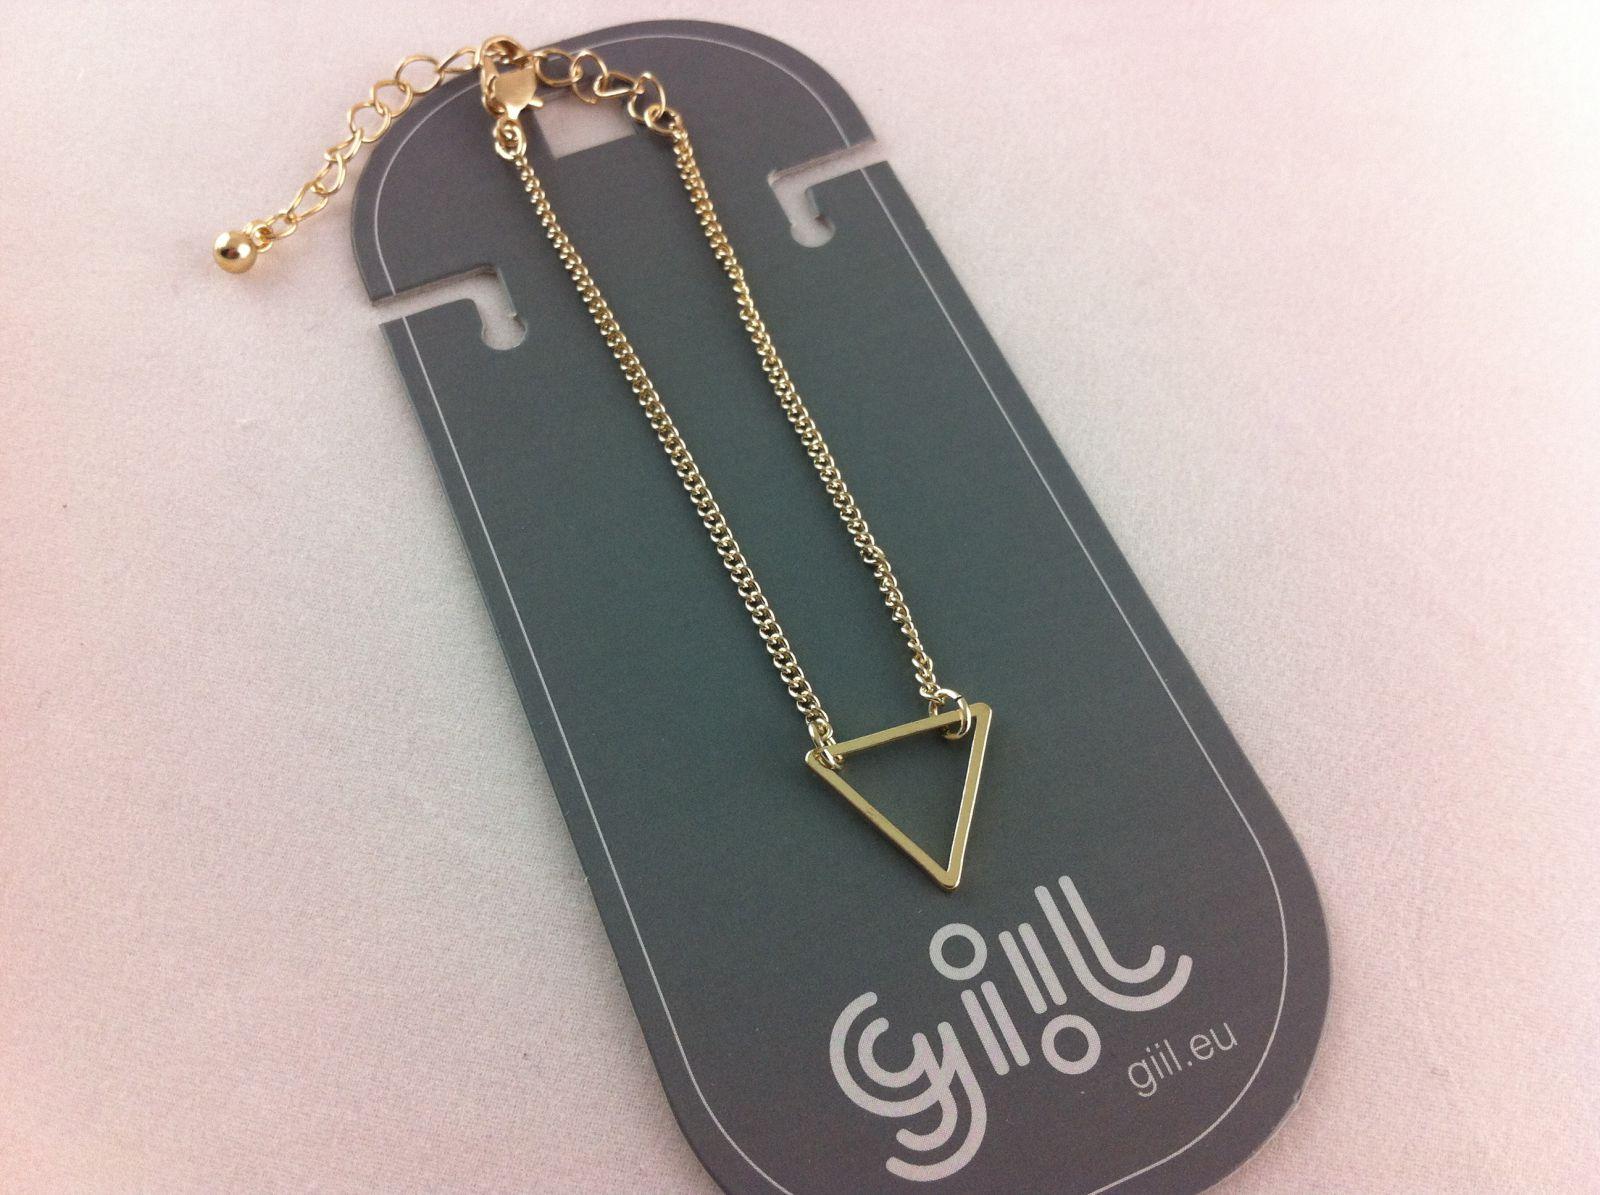 Zlatý jemný náramek s trojúhelníkem GIIL